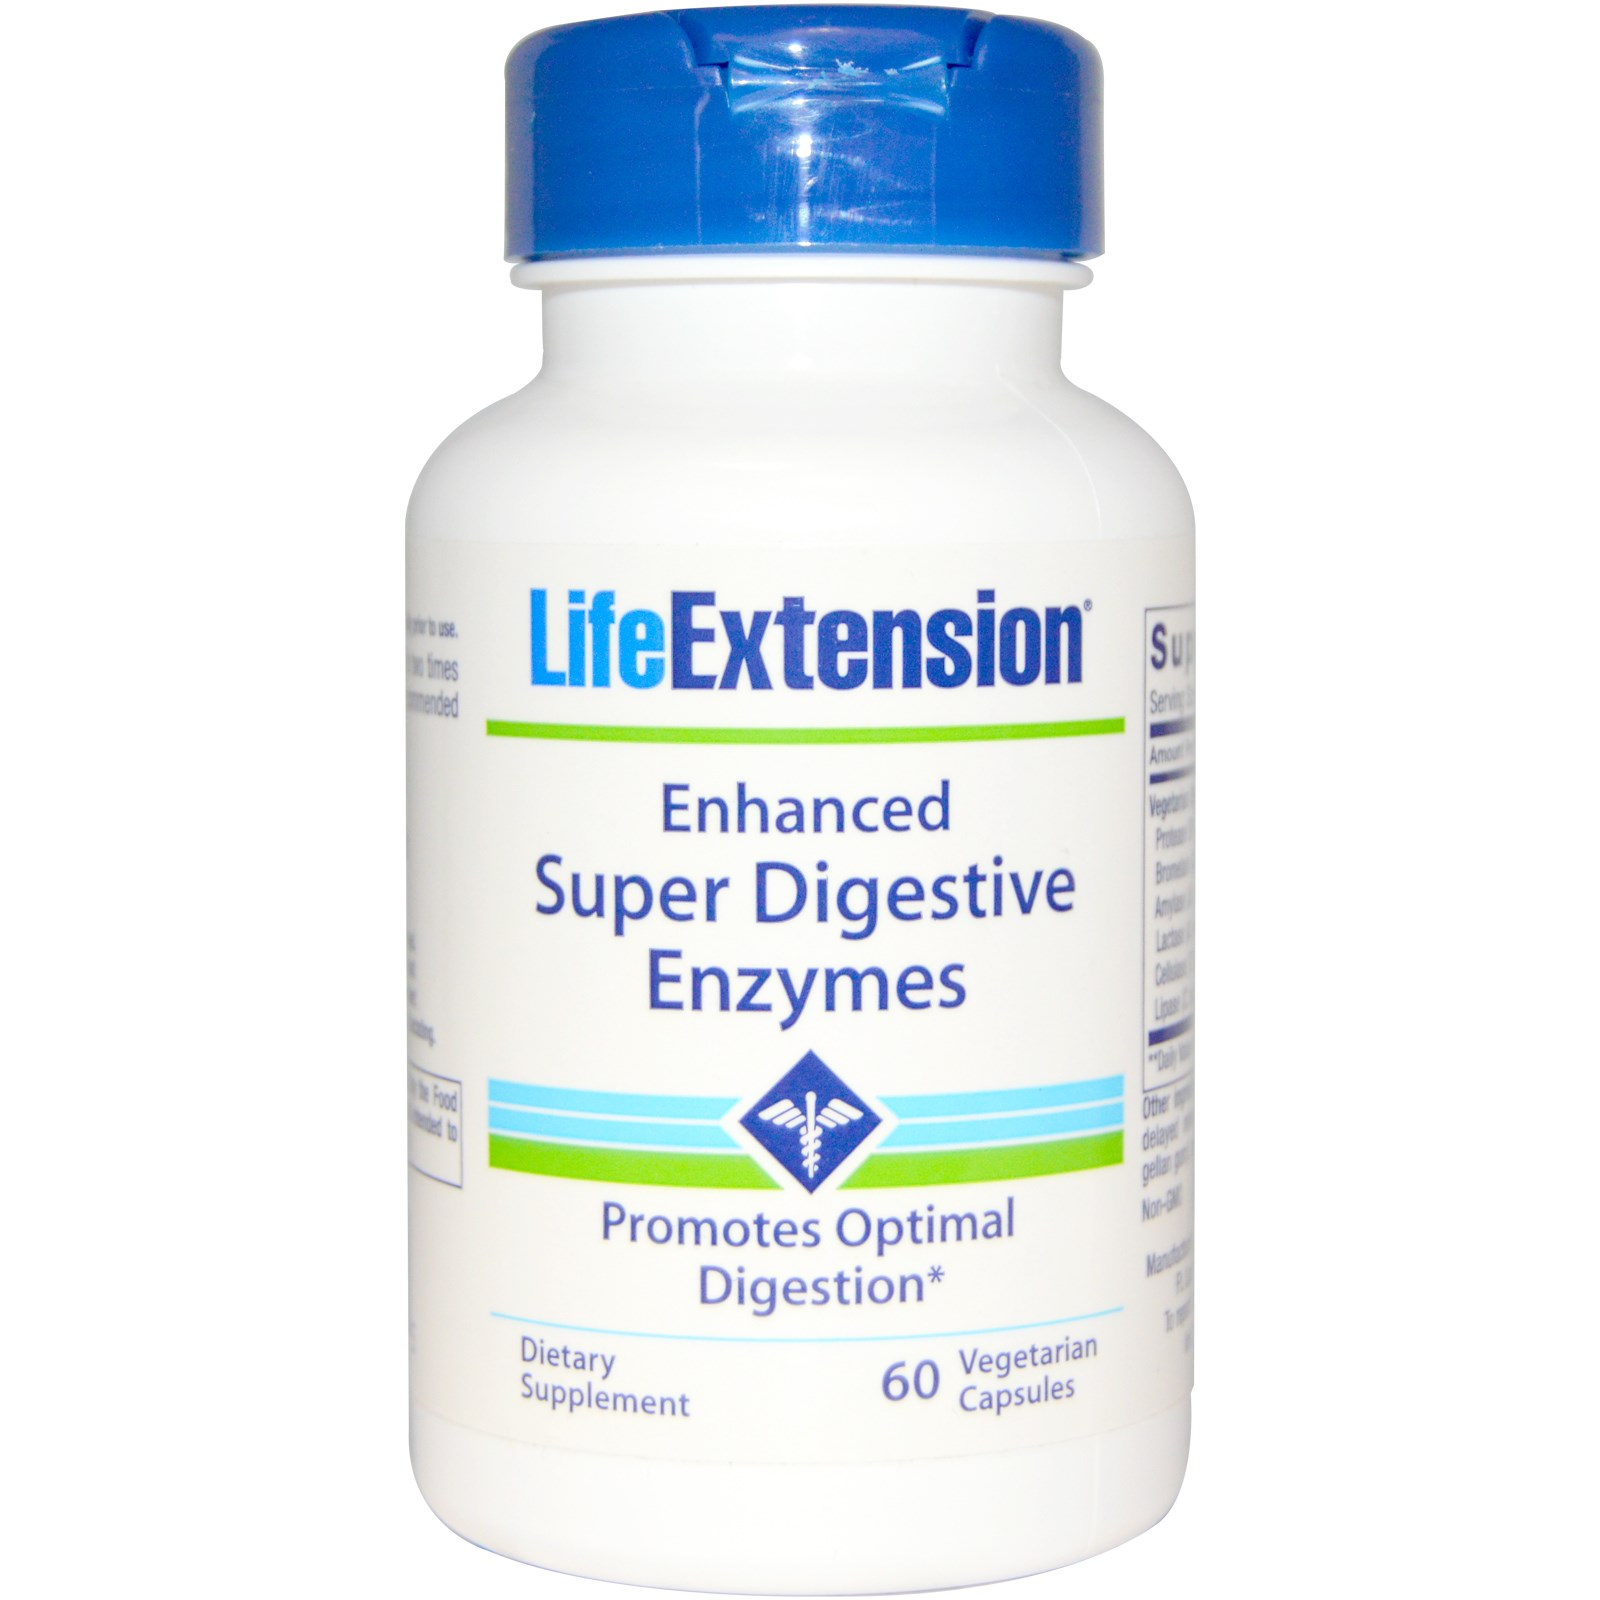 Life Extension Enhanced Super Digestive Enzymes Συμπλήρωμα Διατροφής Για τη Σωστή Λειτουργία του Πεπτικού Συστήματος 60veg.caps